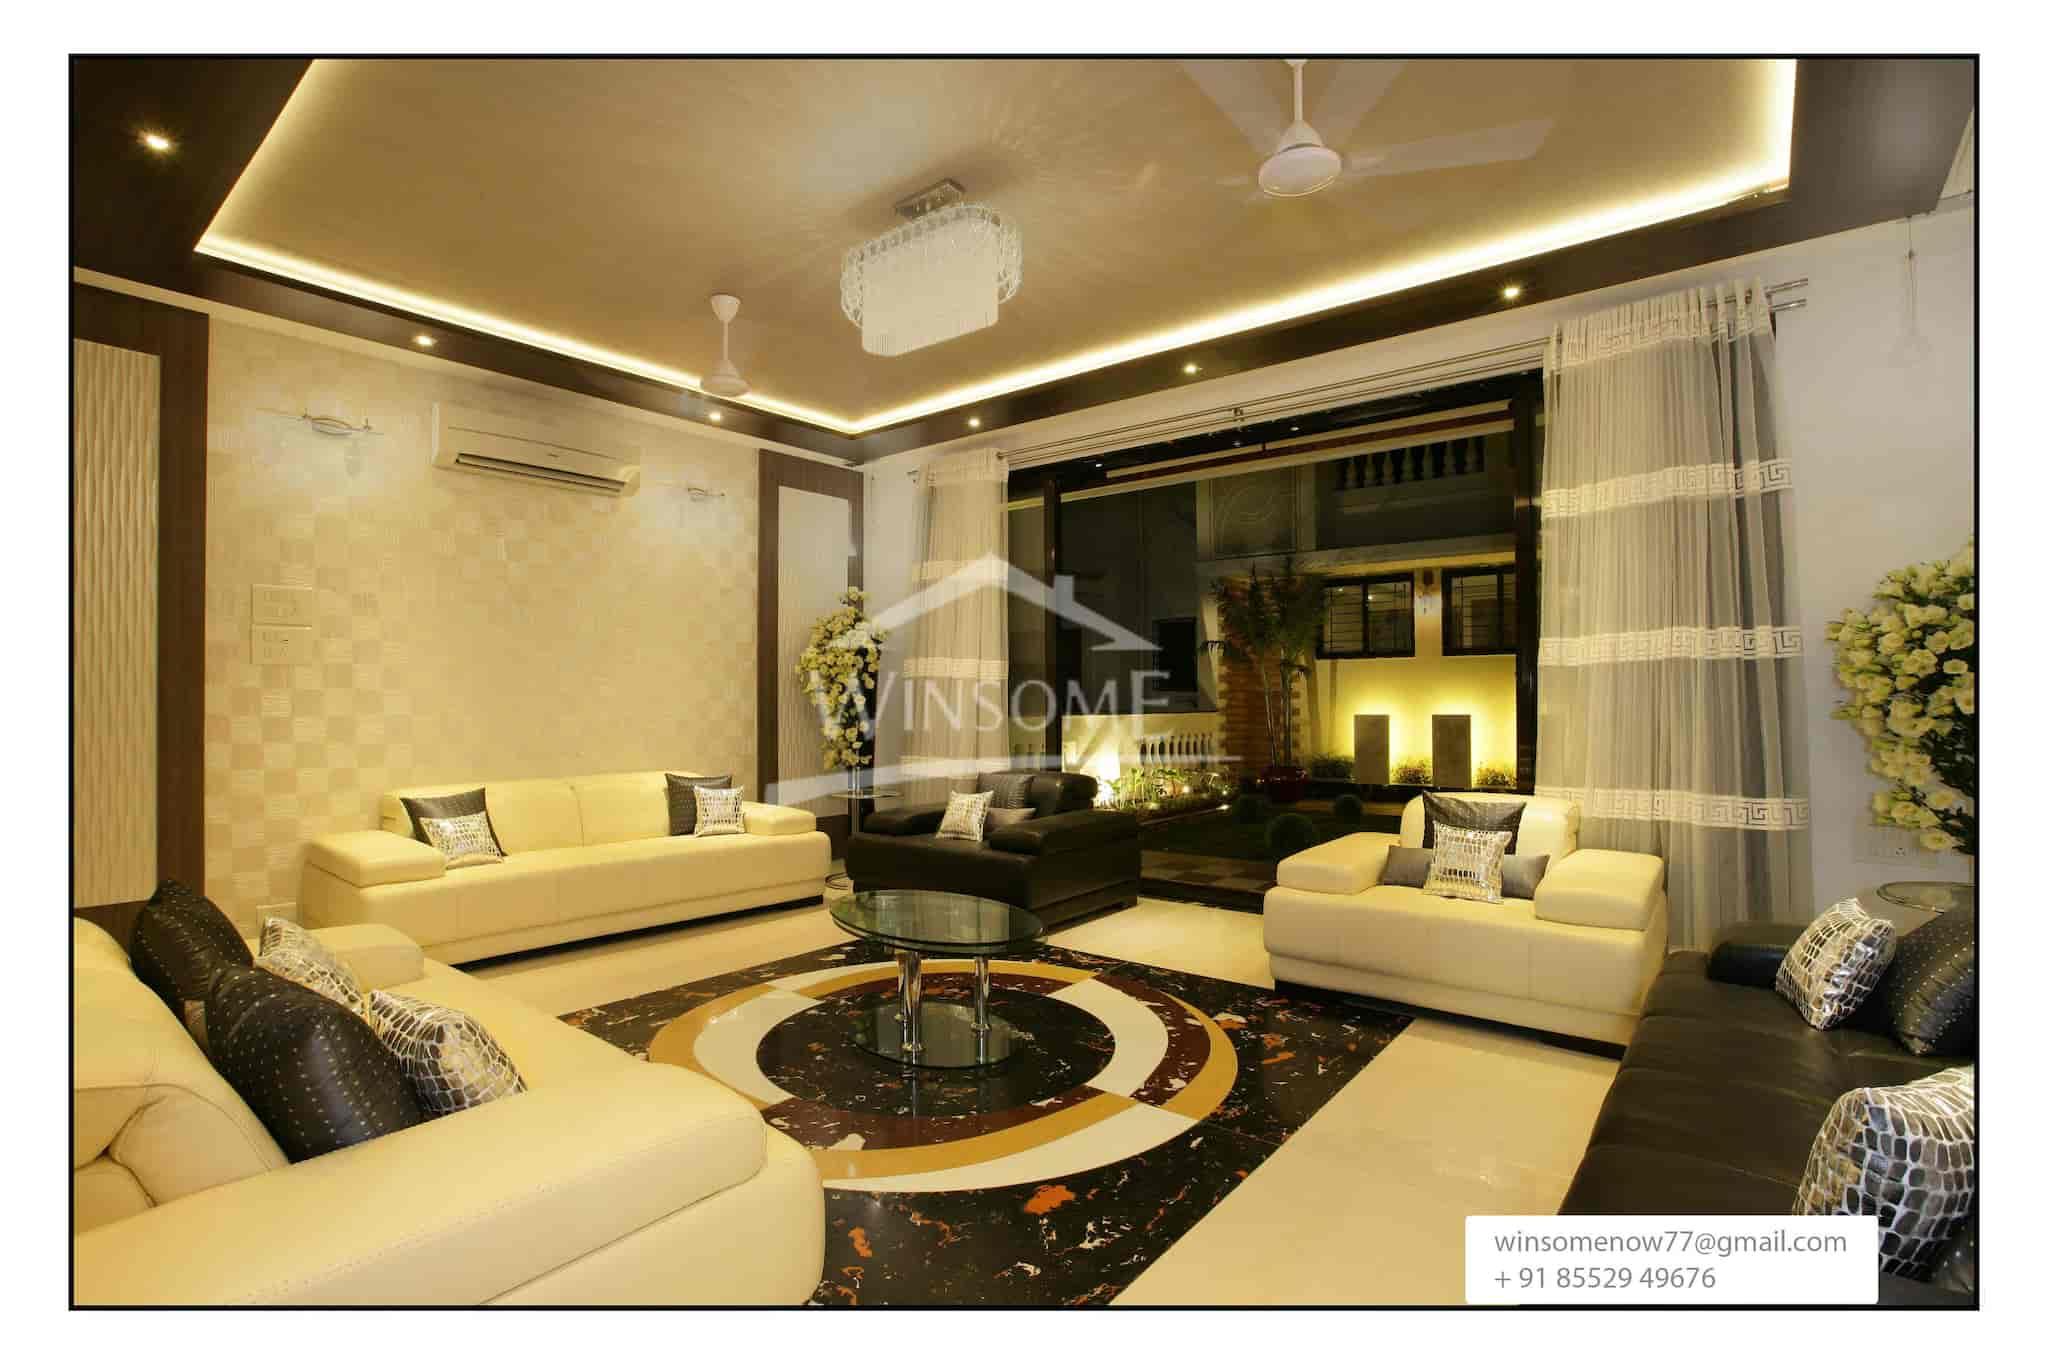 Winsome Interiors And Architect Design s Adarsh Nagar Wadgaon